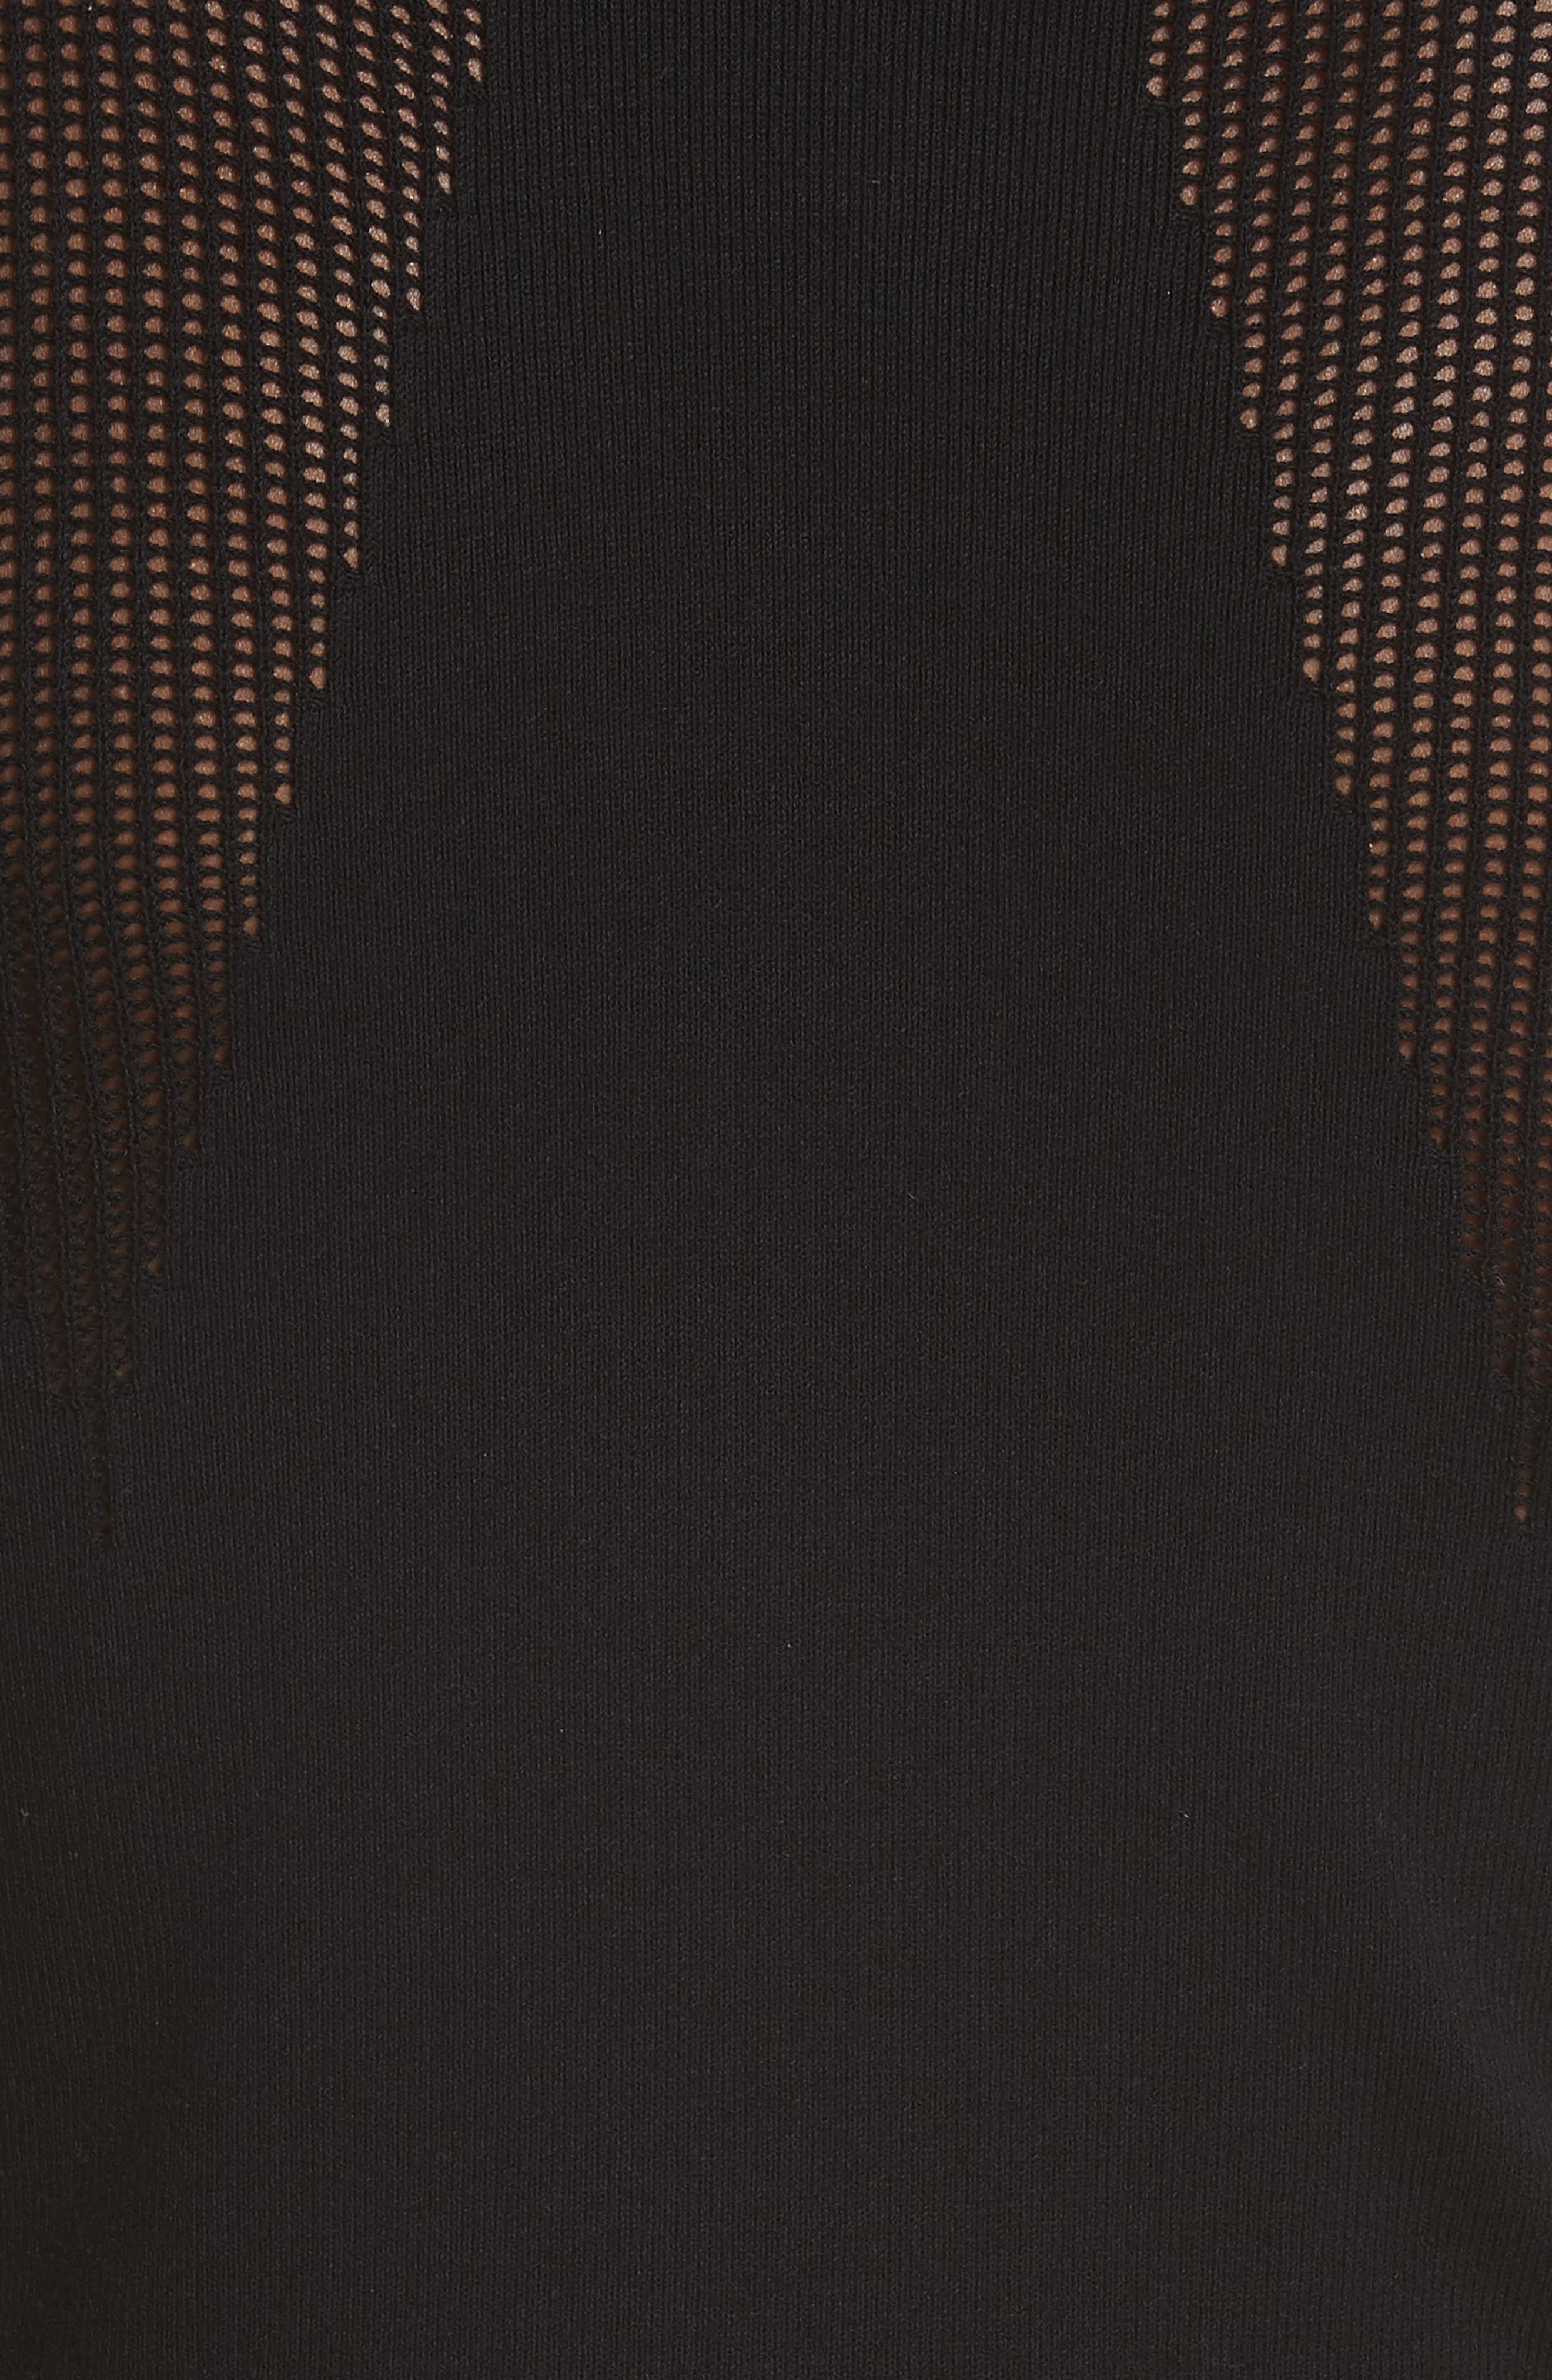 VERSACE COLLECTION, Logo Trim Body-Con Dress, Alternate thumbnail 6, color, BLACK